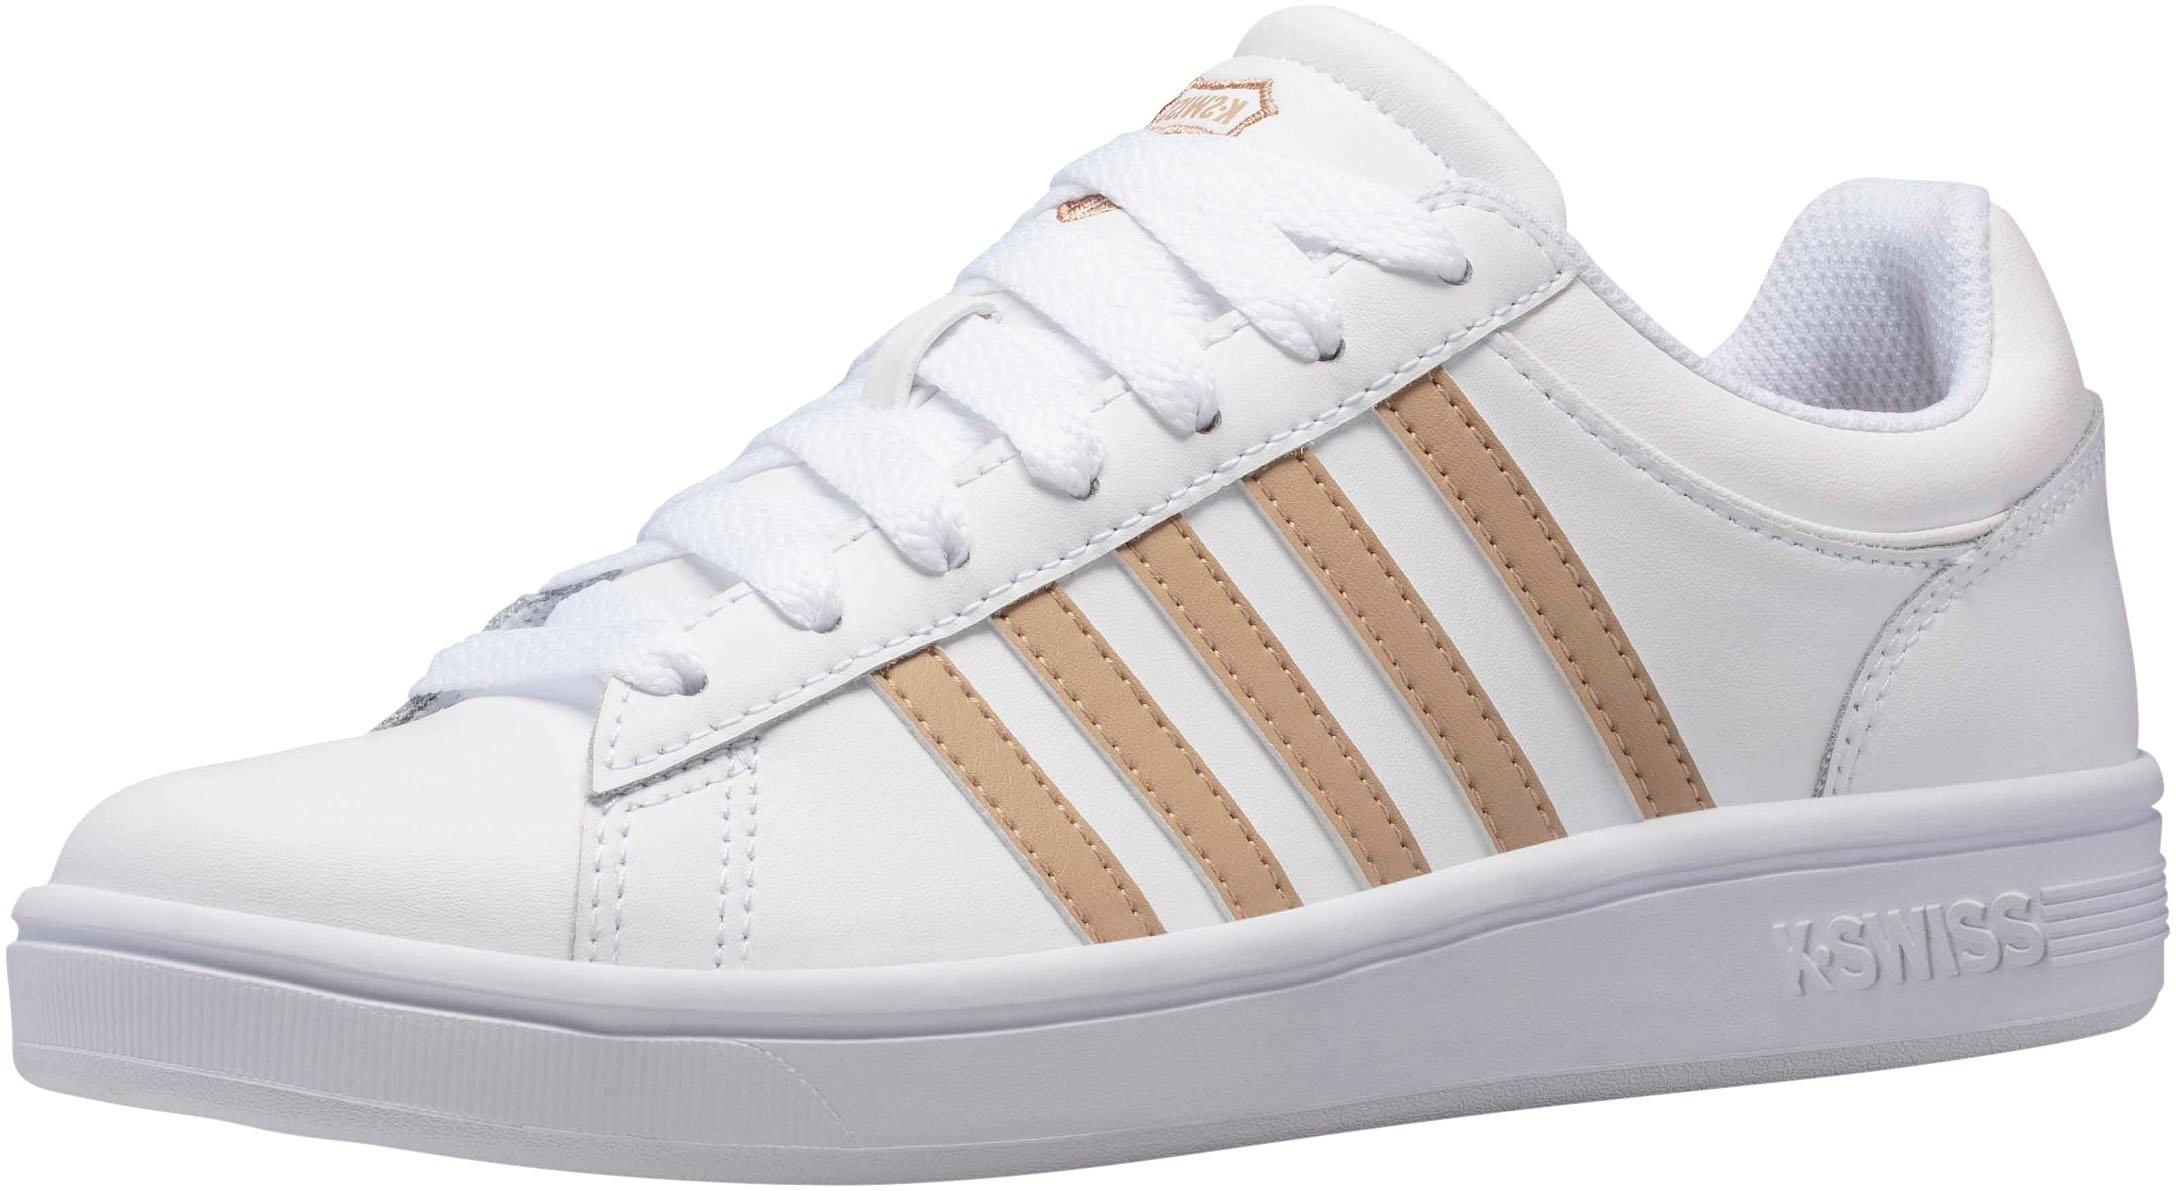 K-SWISS sneakers »Court Winston W« bestellen: 30 dagen bedenktijd